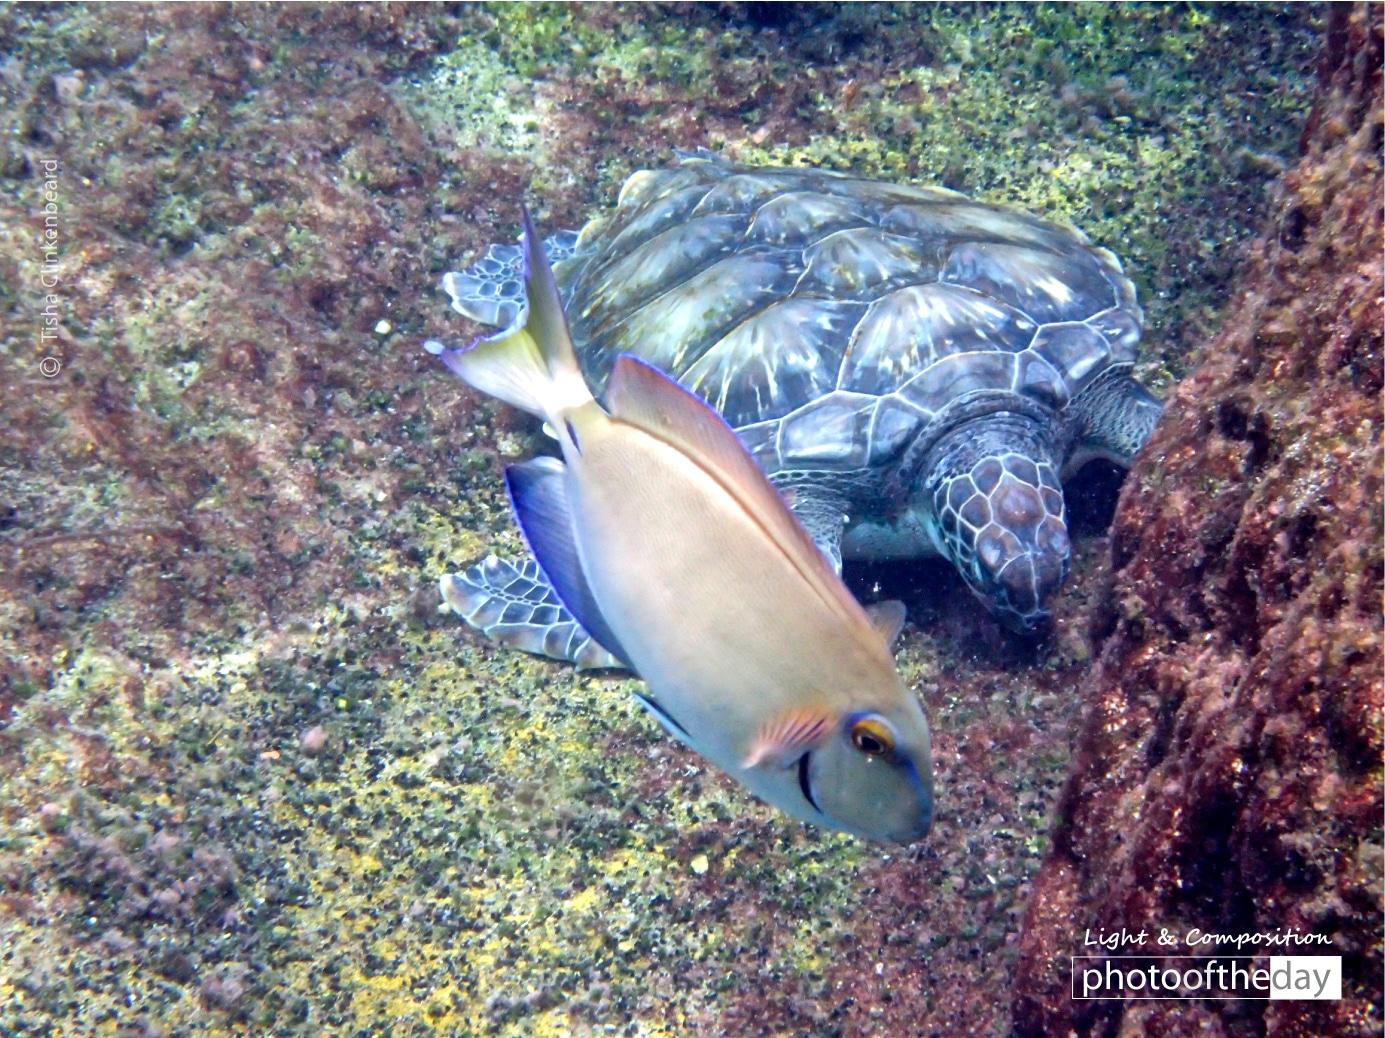 Smiling Fish and Turtle, by Tisha Clinkenbeard